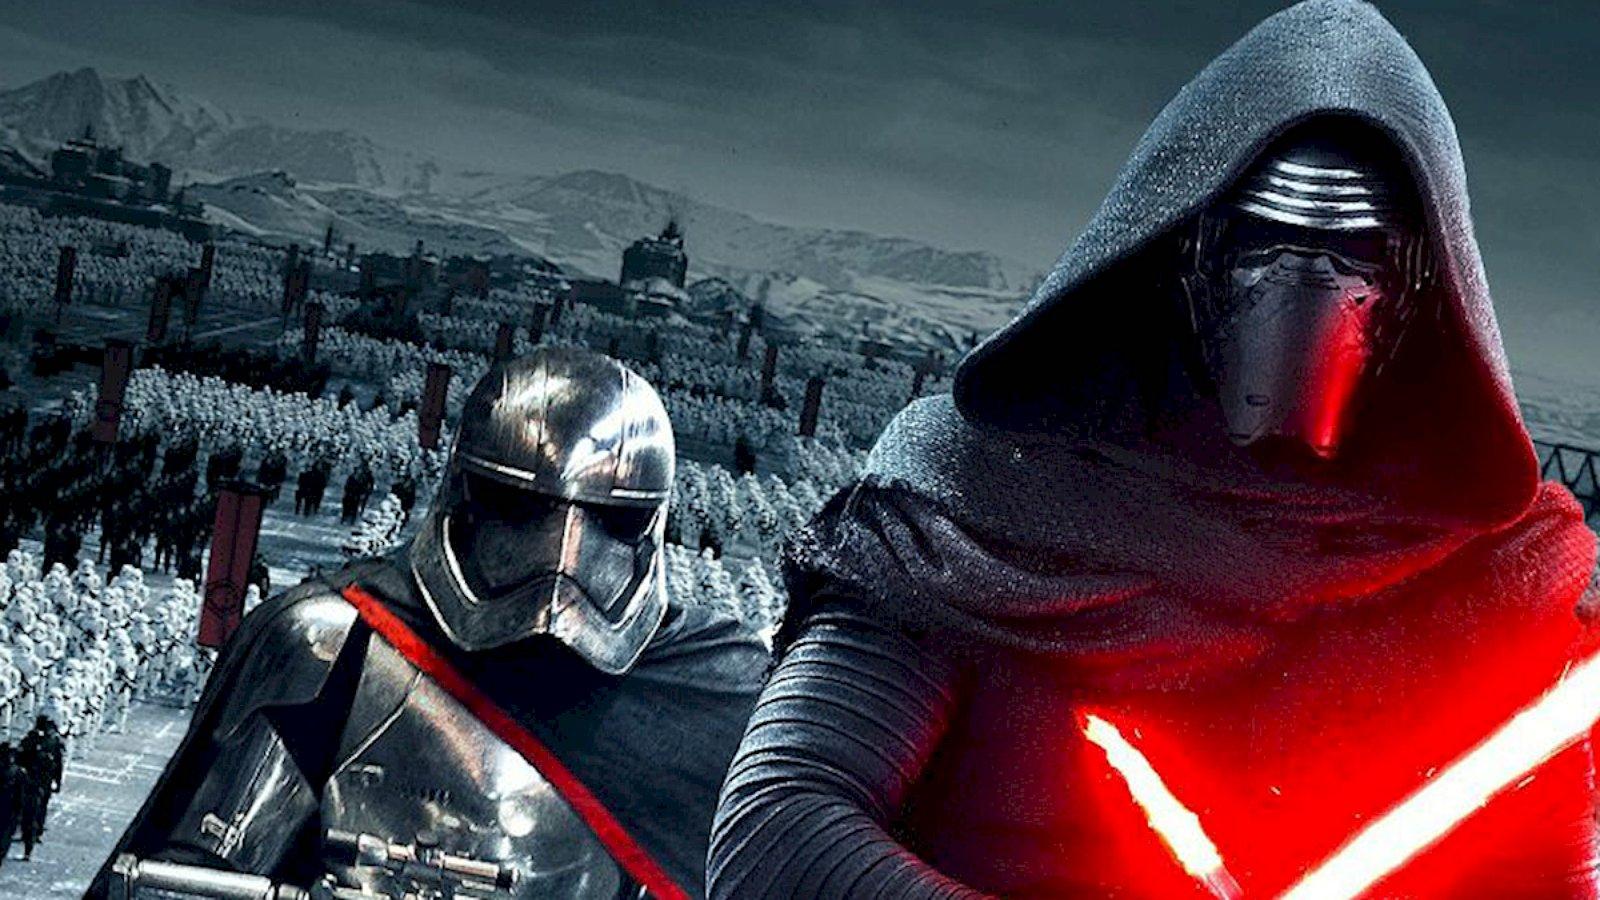 Star Wars Force Awakens Sci Fi Futuristic Disney Action Adventure